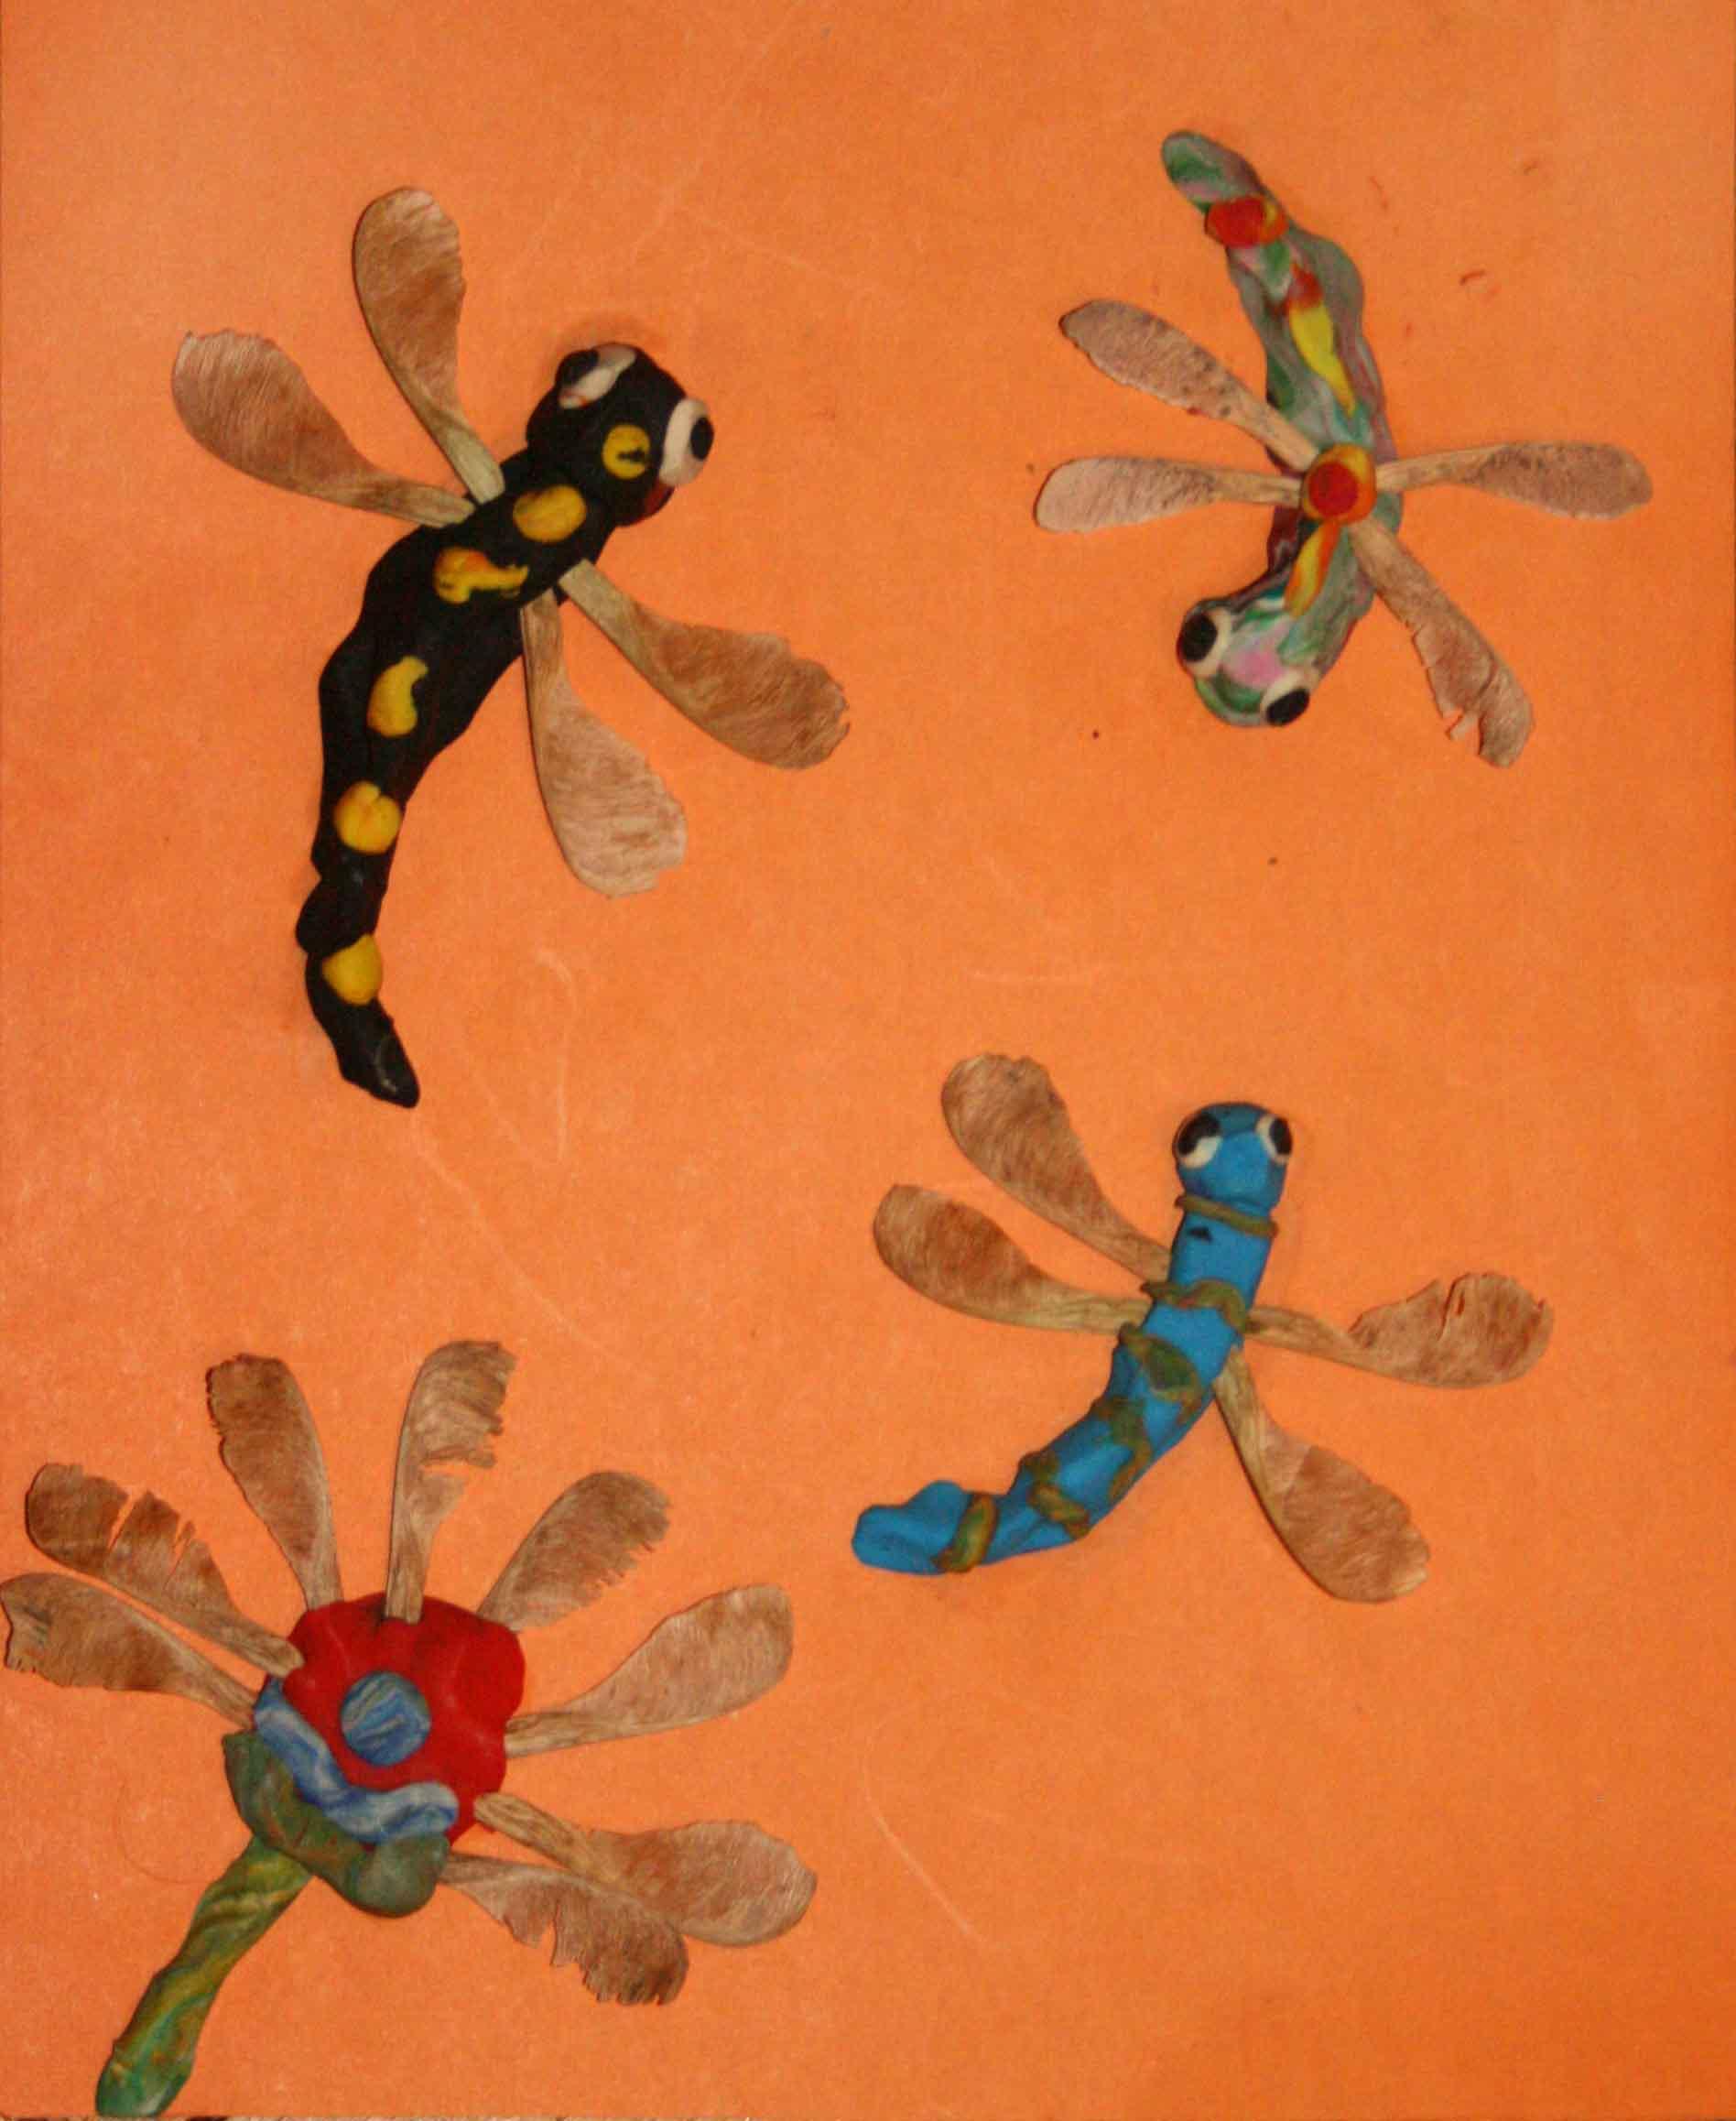 Поделки из крупы и пластилина - стрекоза